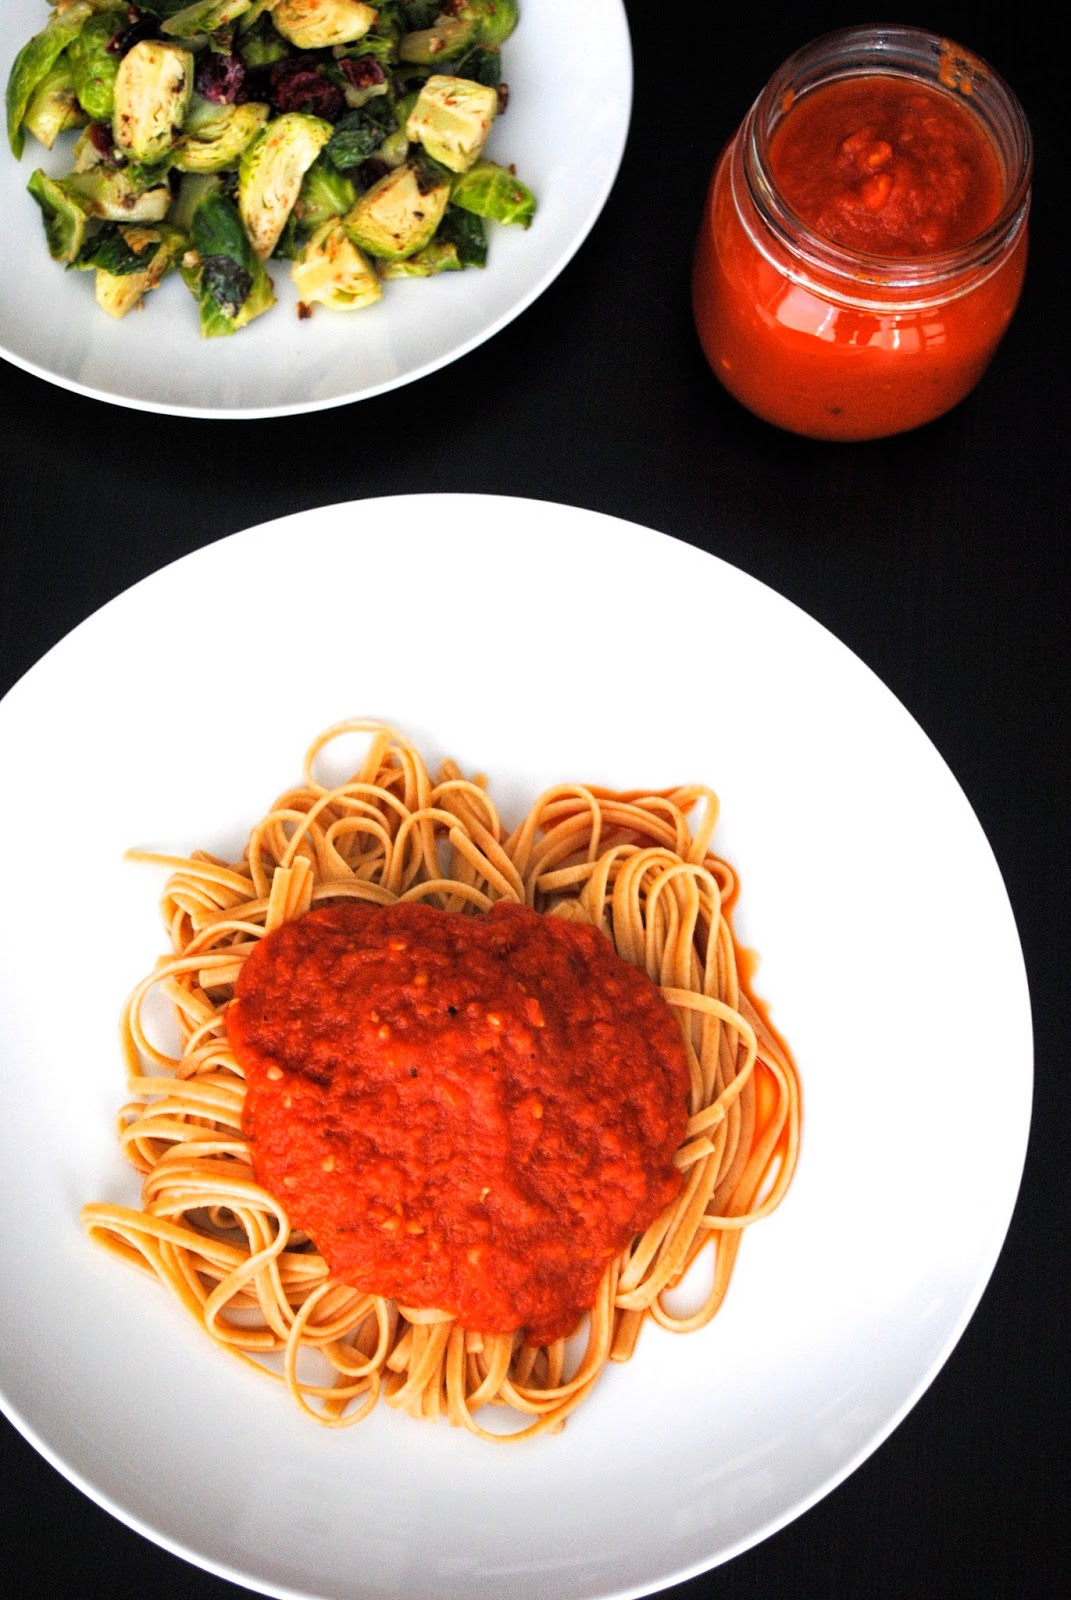 Kitchin-it: Homemade Healthy Tomato Sauce!